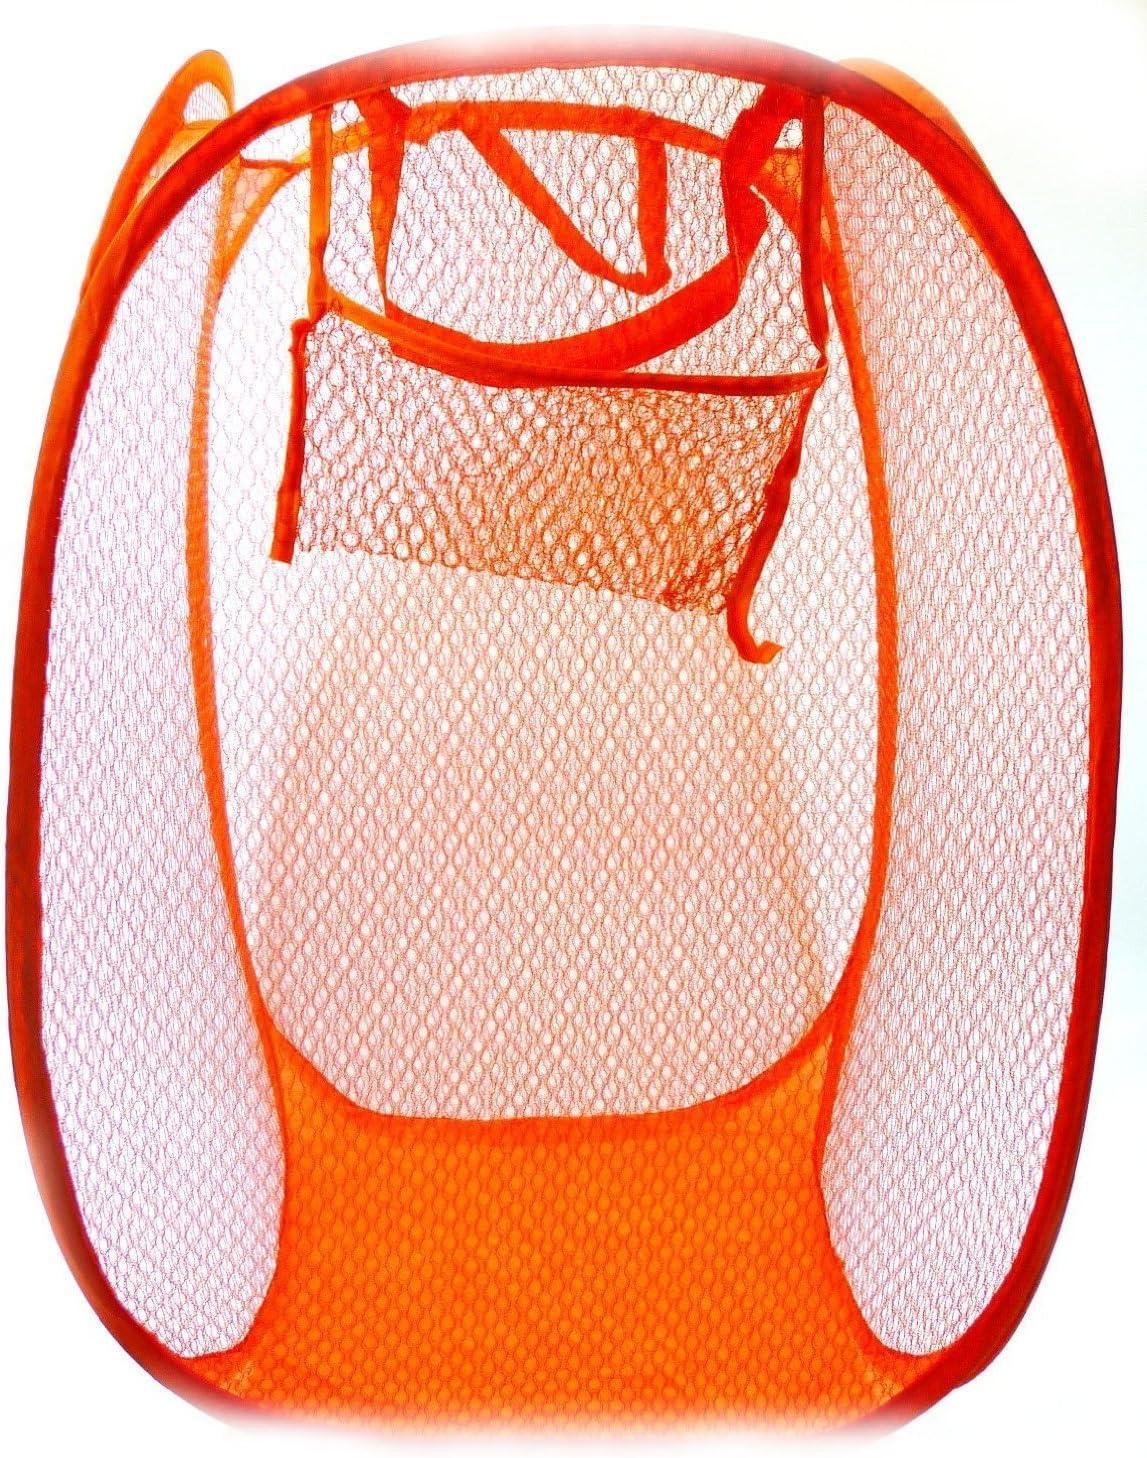 Bajer Max 5 popular 52% OFF Deisgn Pop-Open Laundry Hamper